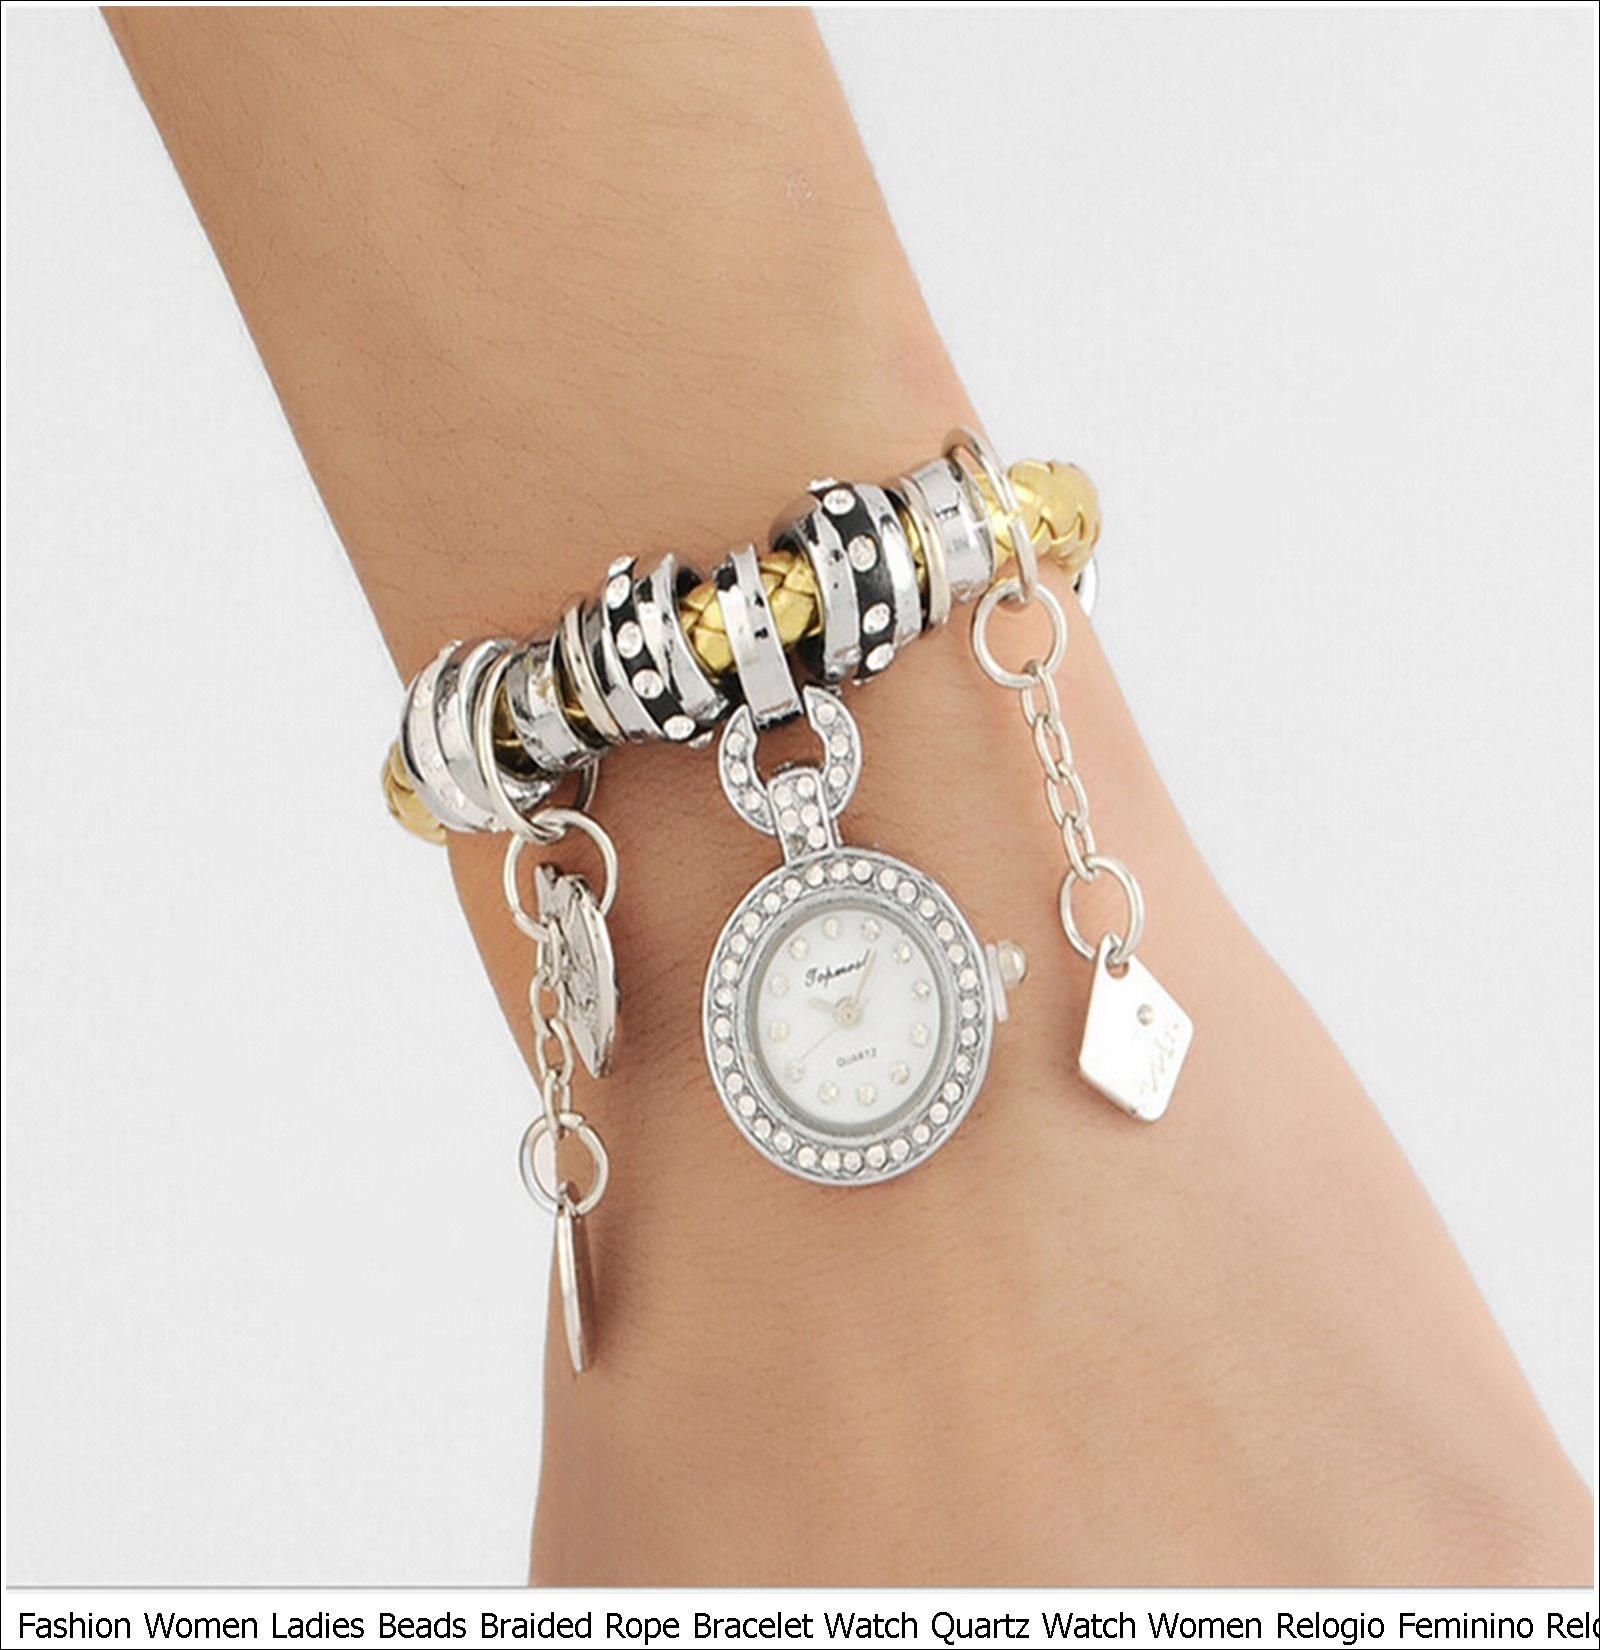 Fashion Women Ladies Beads Braided Rope Bracelet Watch Quartz Watch Women Relogio Feminino Relojes Watches